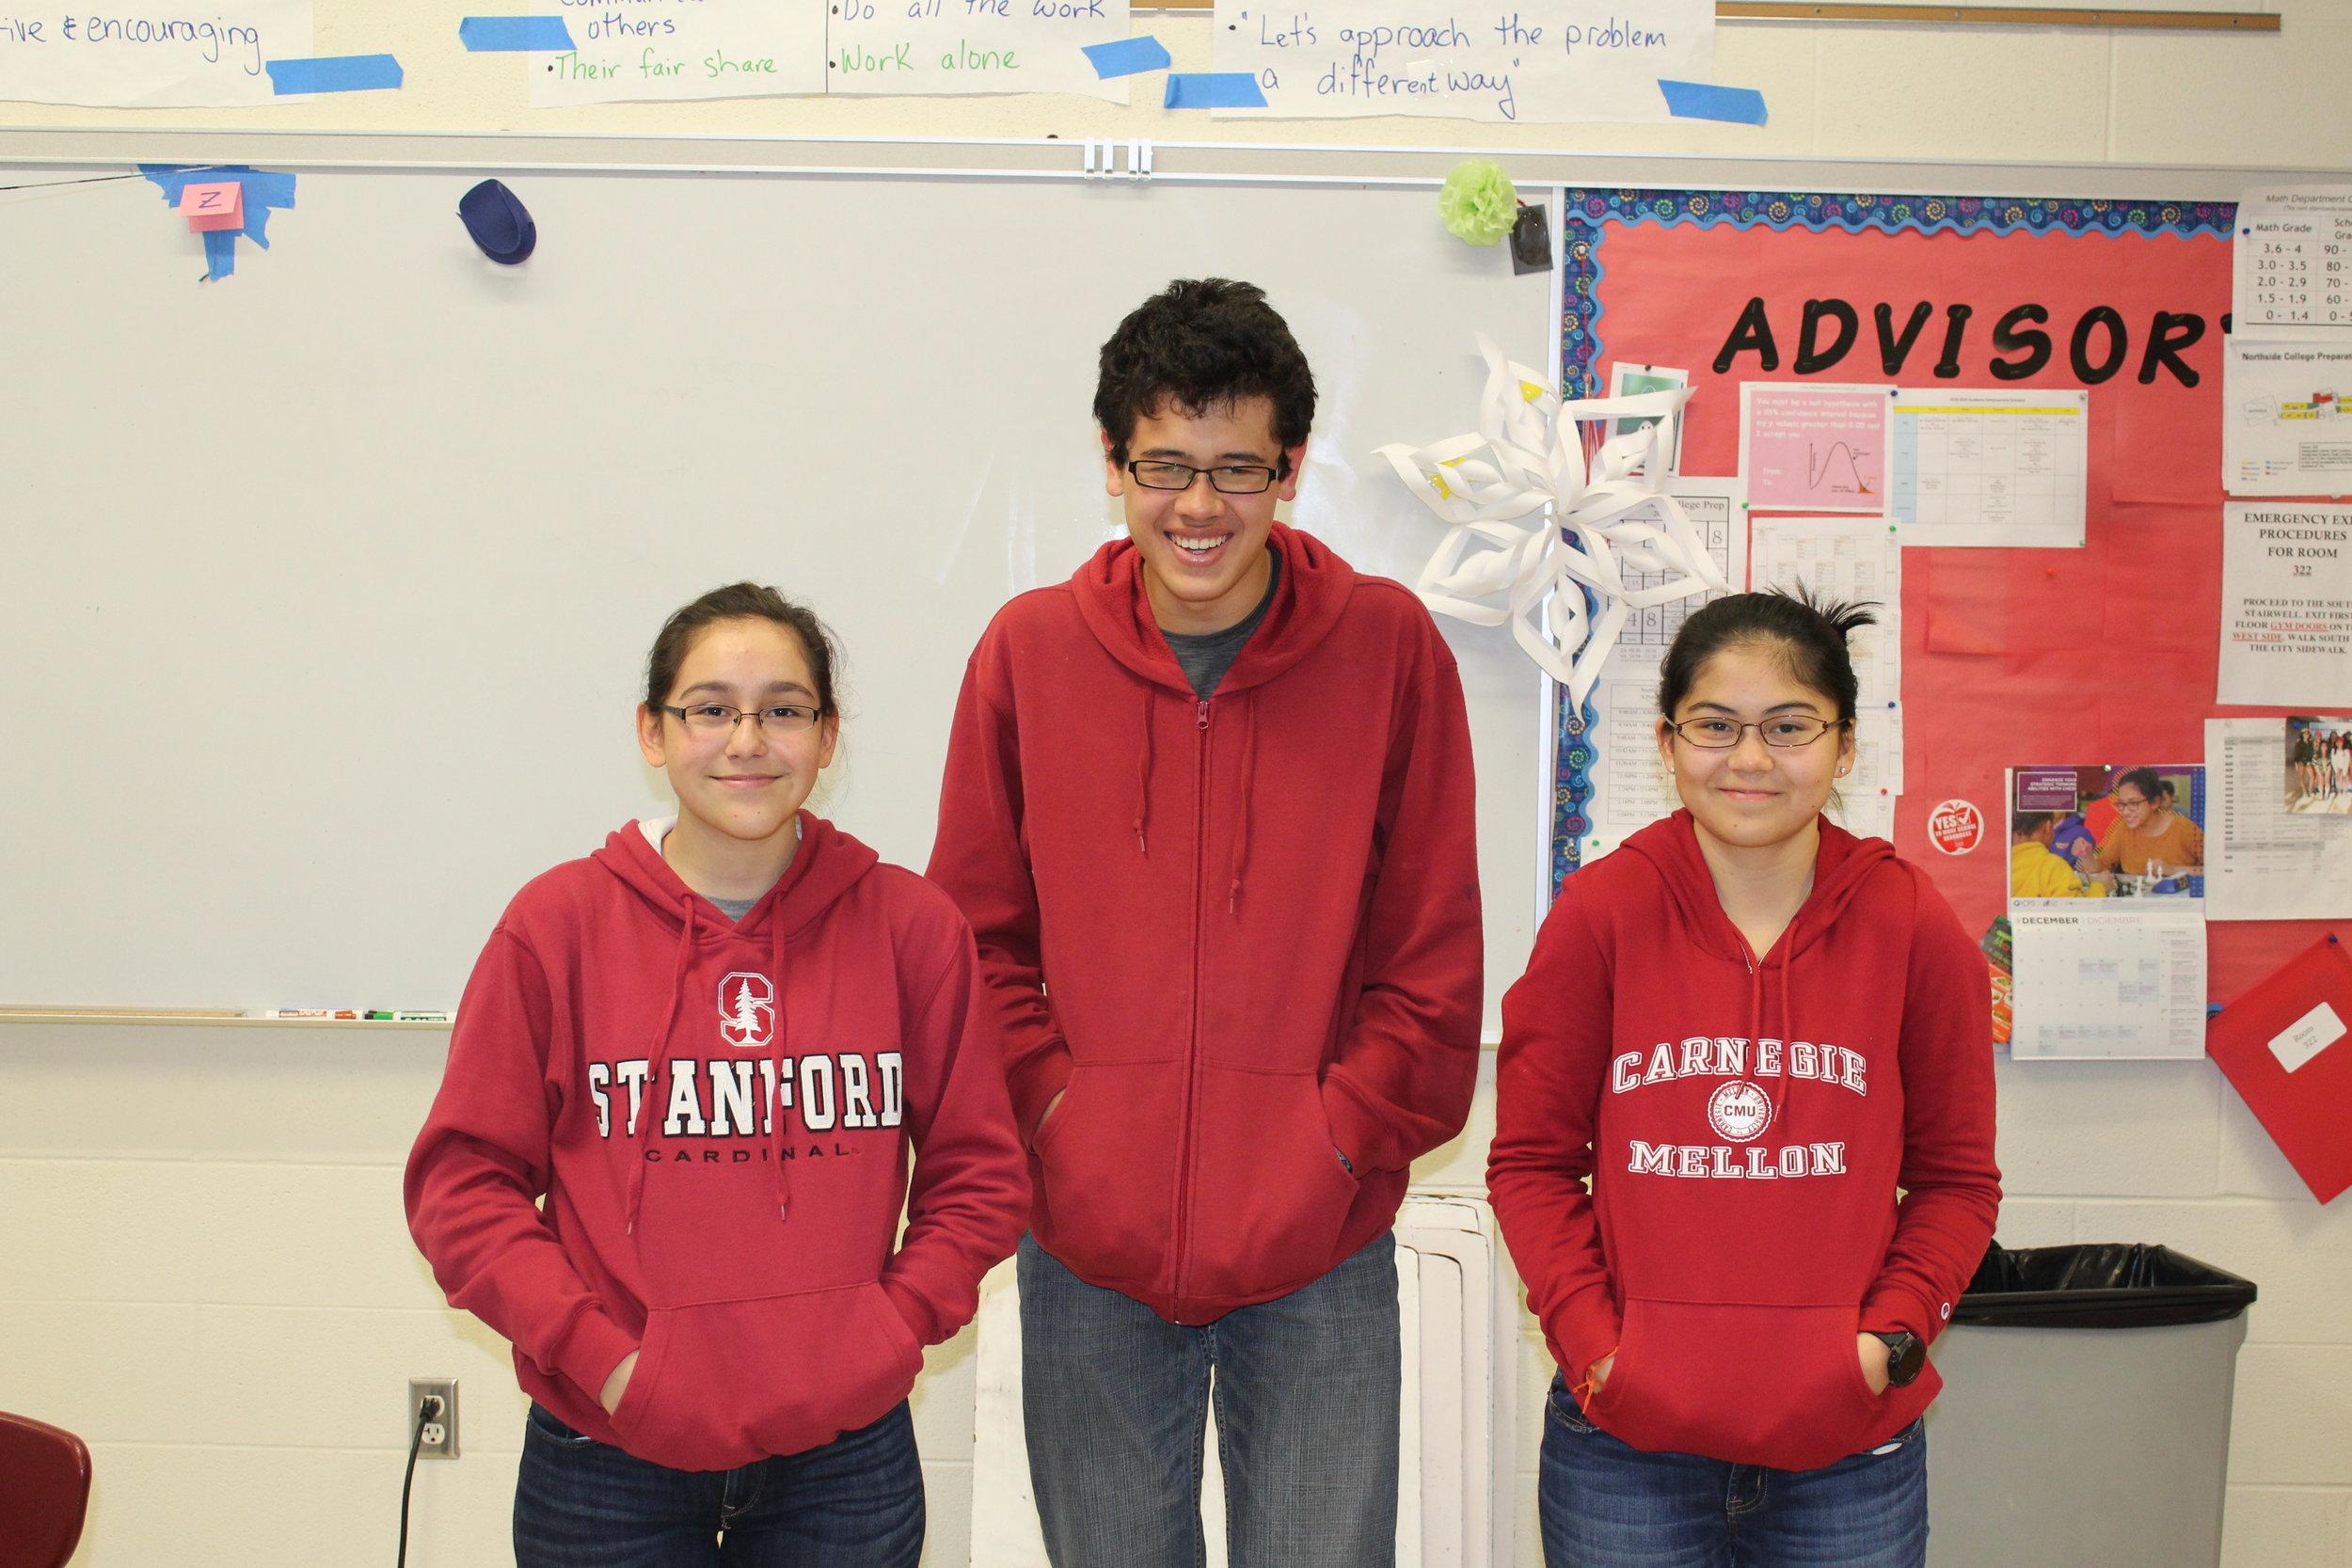 Gabriela Jimenez, Adv. 902, and Audrey McManus, Adv. 900, twinning as Robert Claud, Adv. 911, (center) for twin day